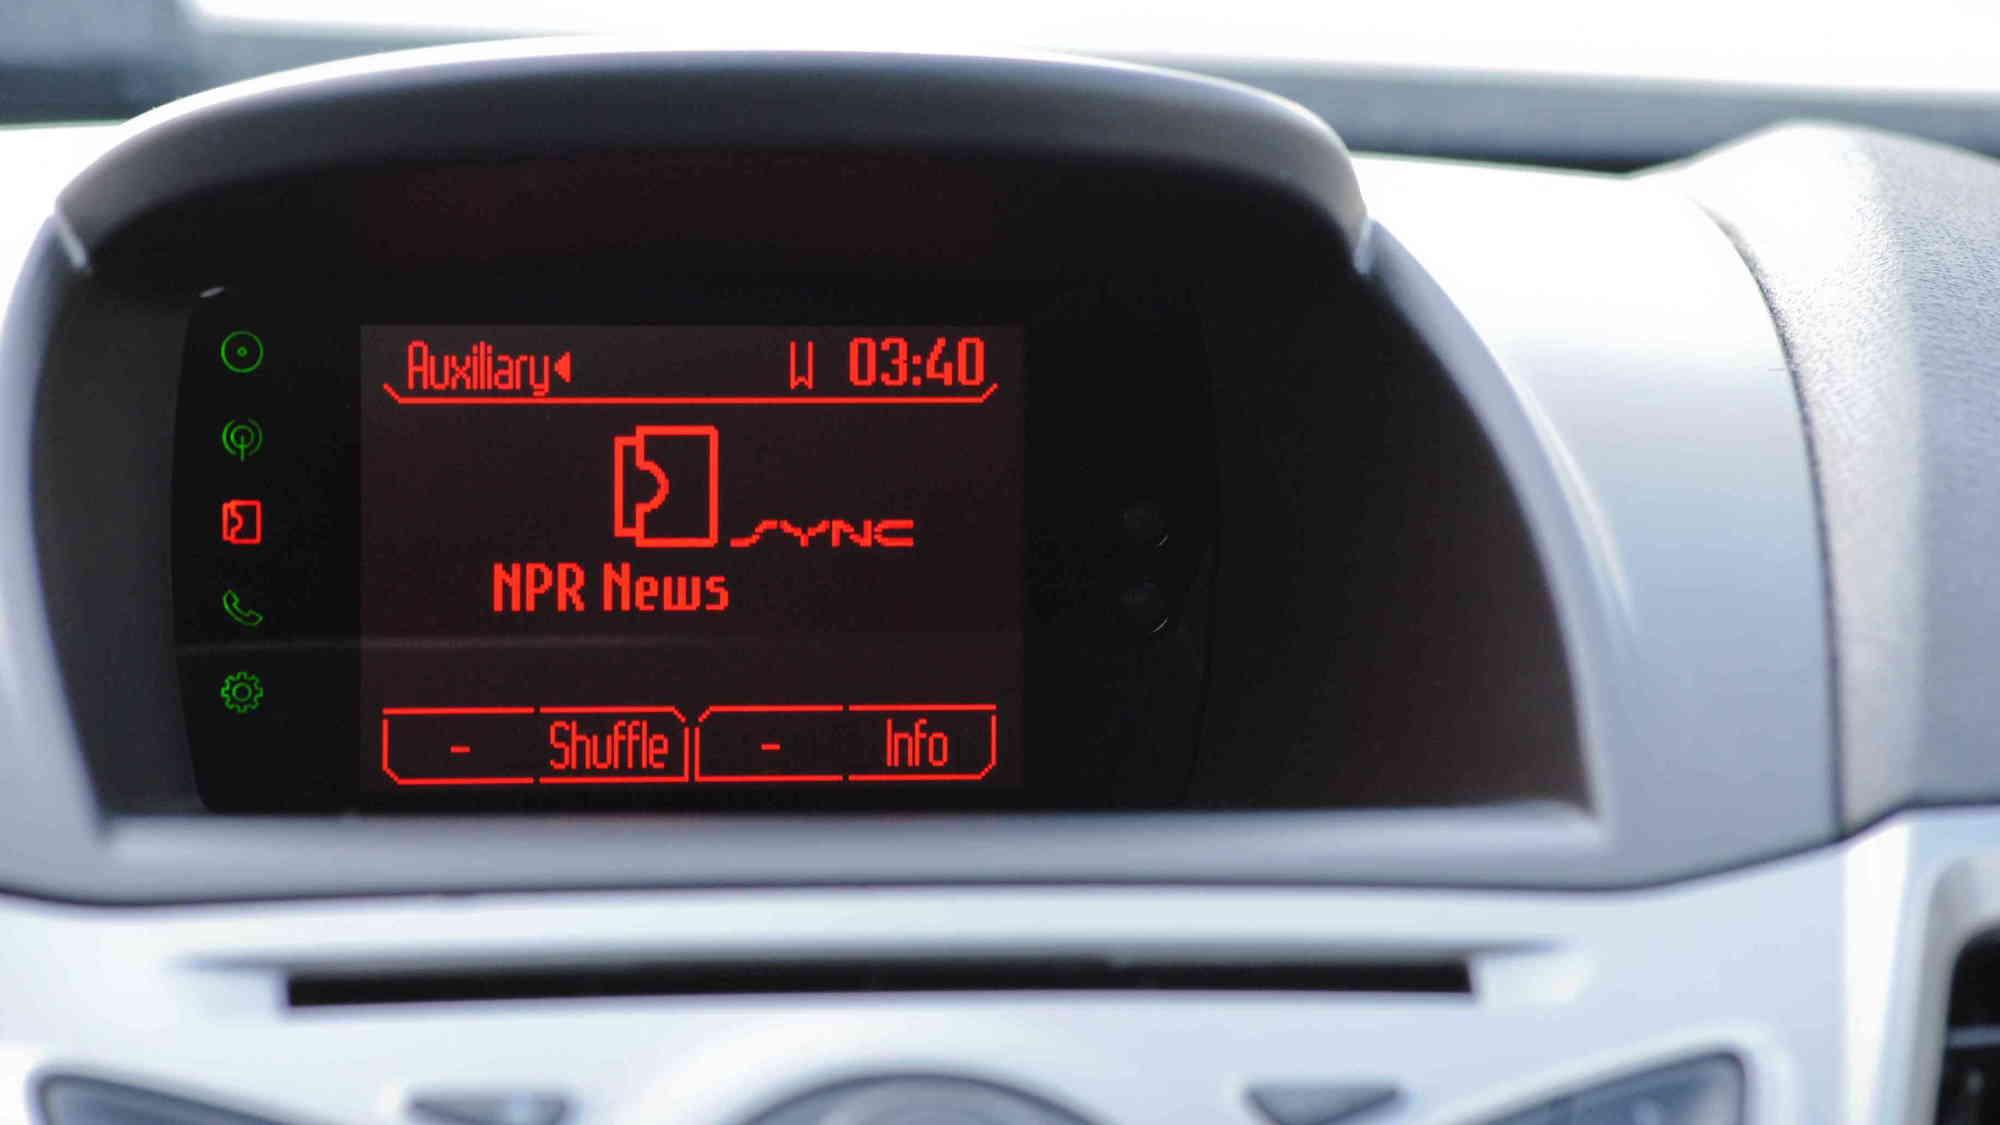 NPR News App with Ford Sync AppLink  -  2012 CES